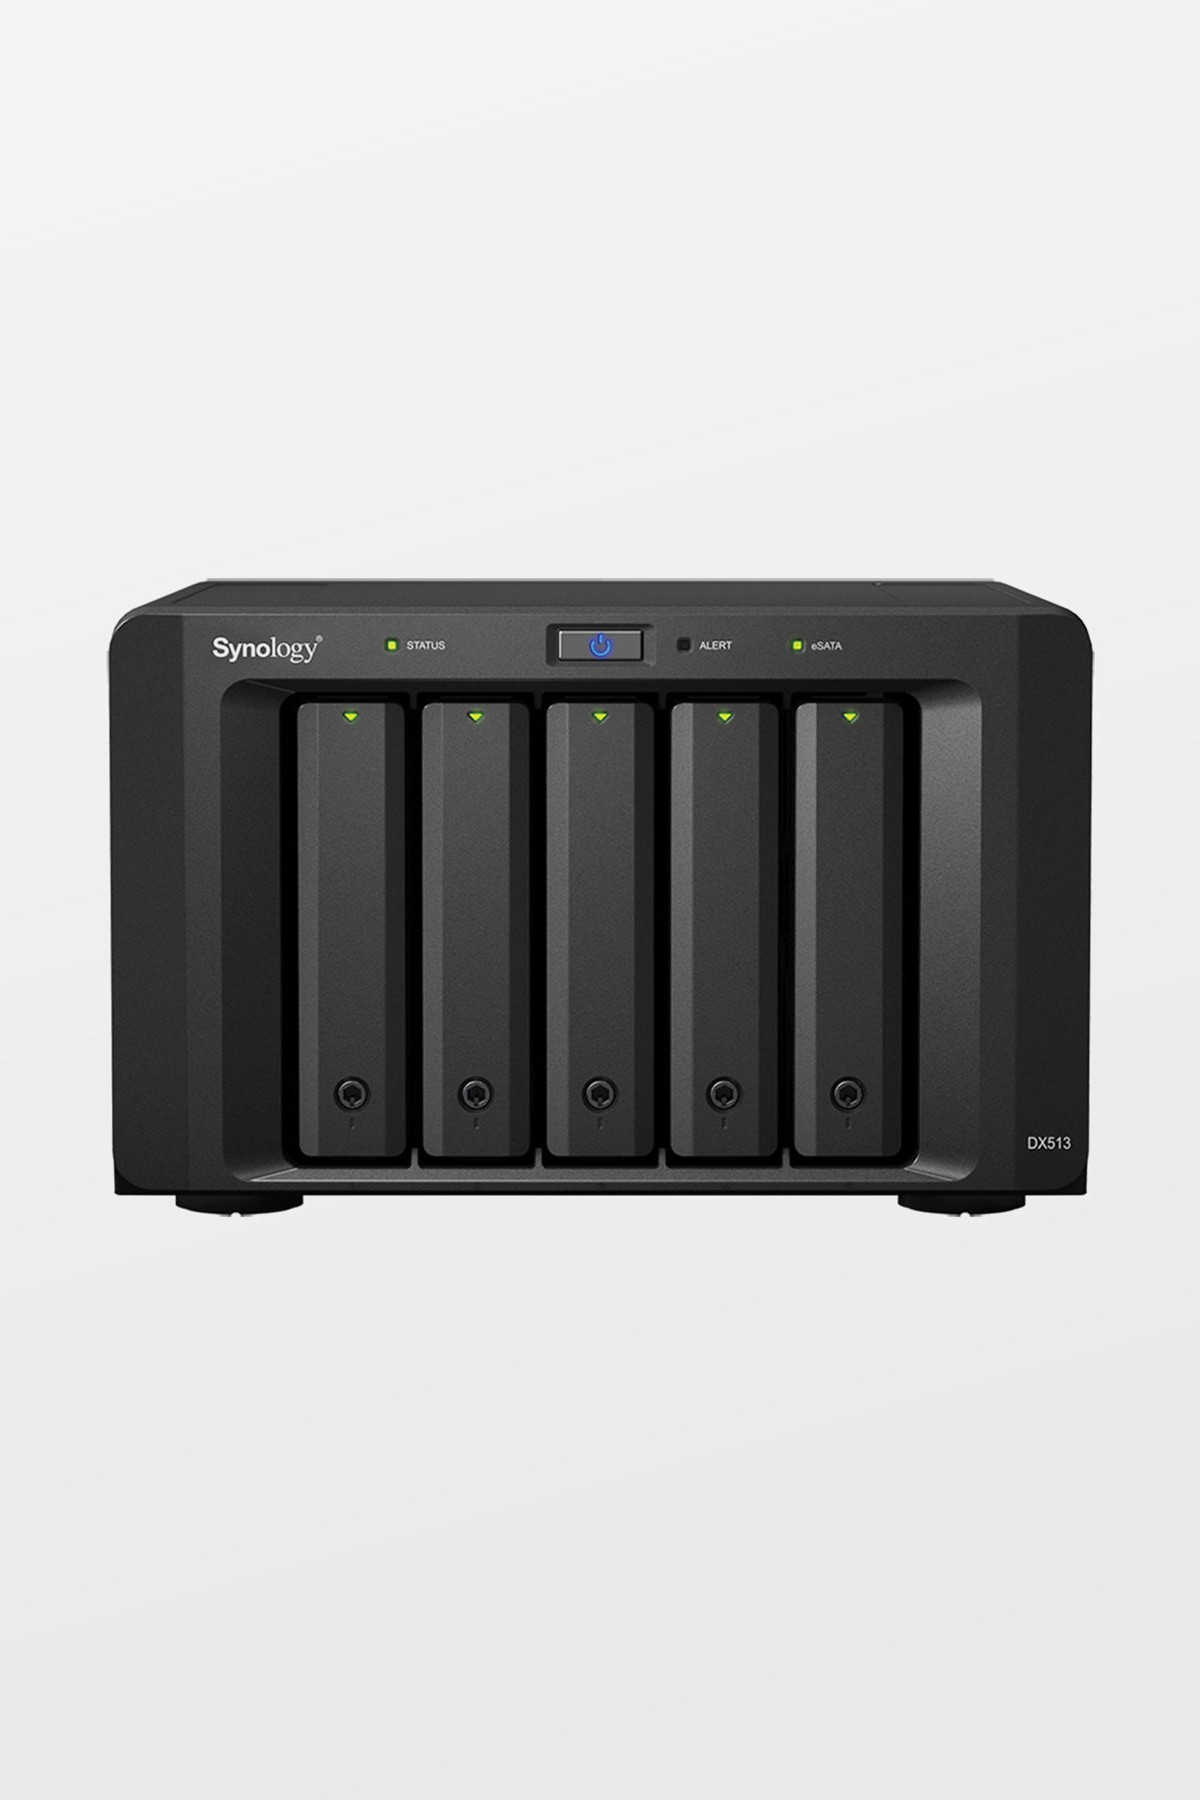 Synology DX513 DiskStation Expansion - 5 Bay